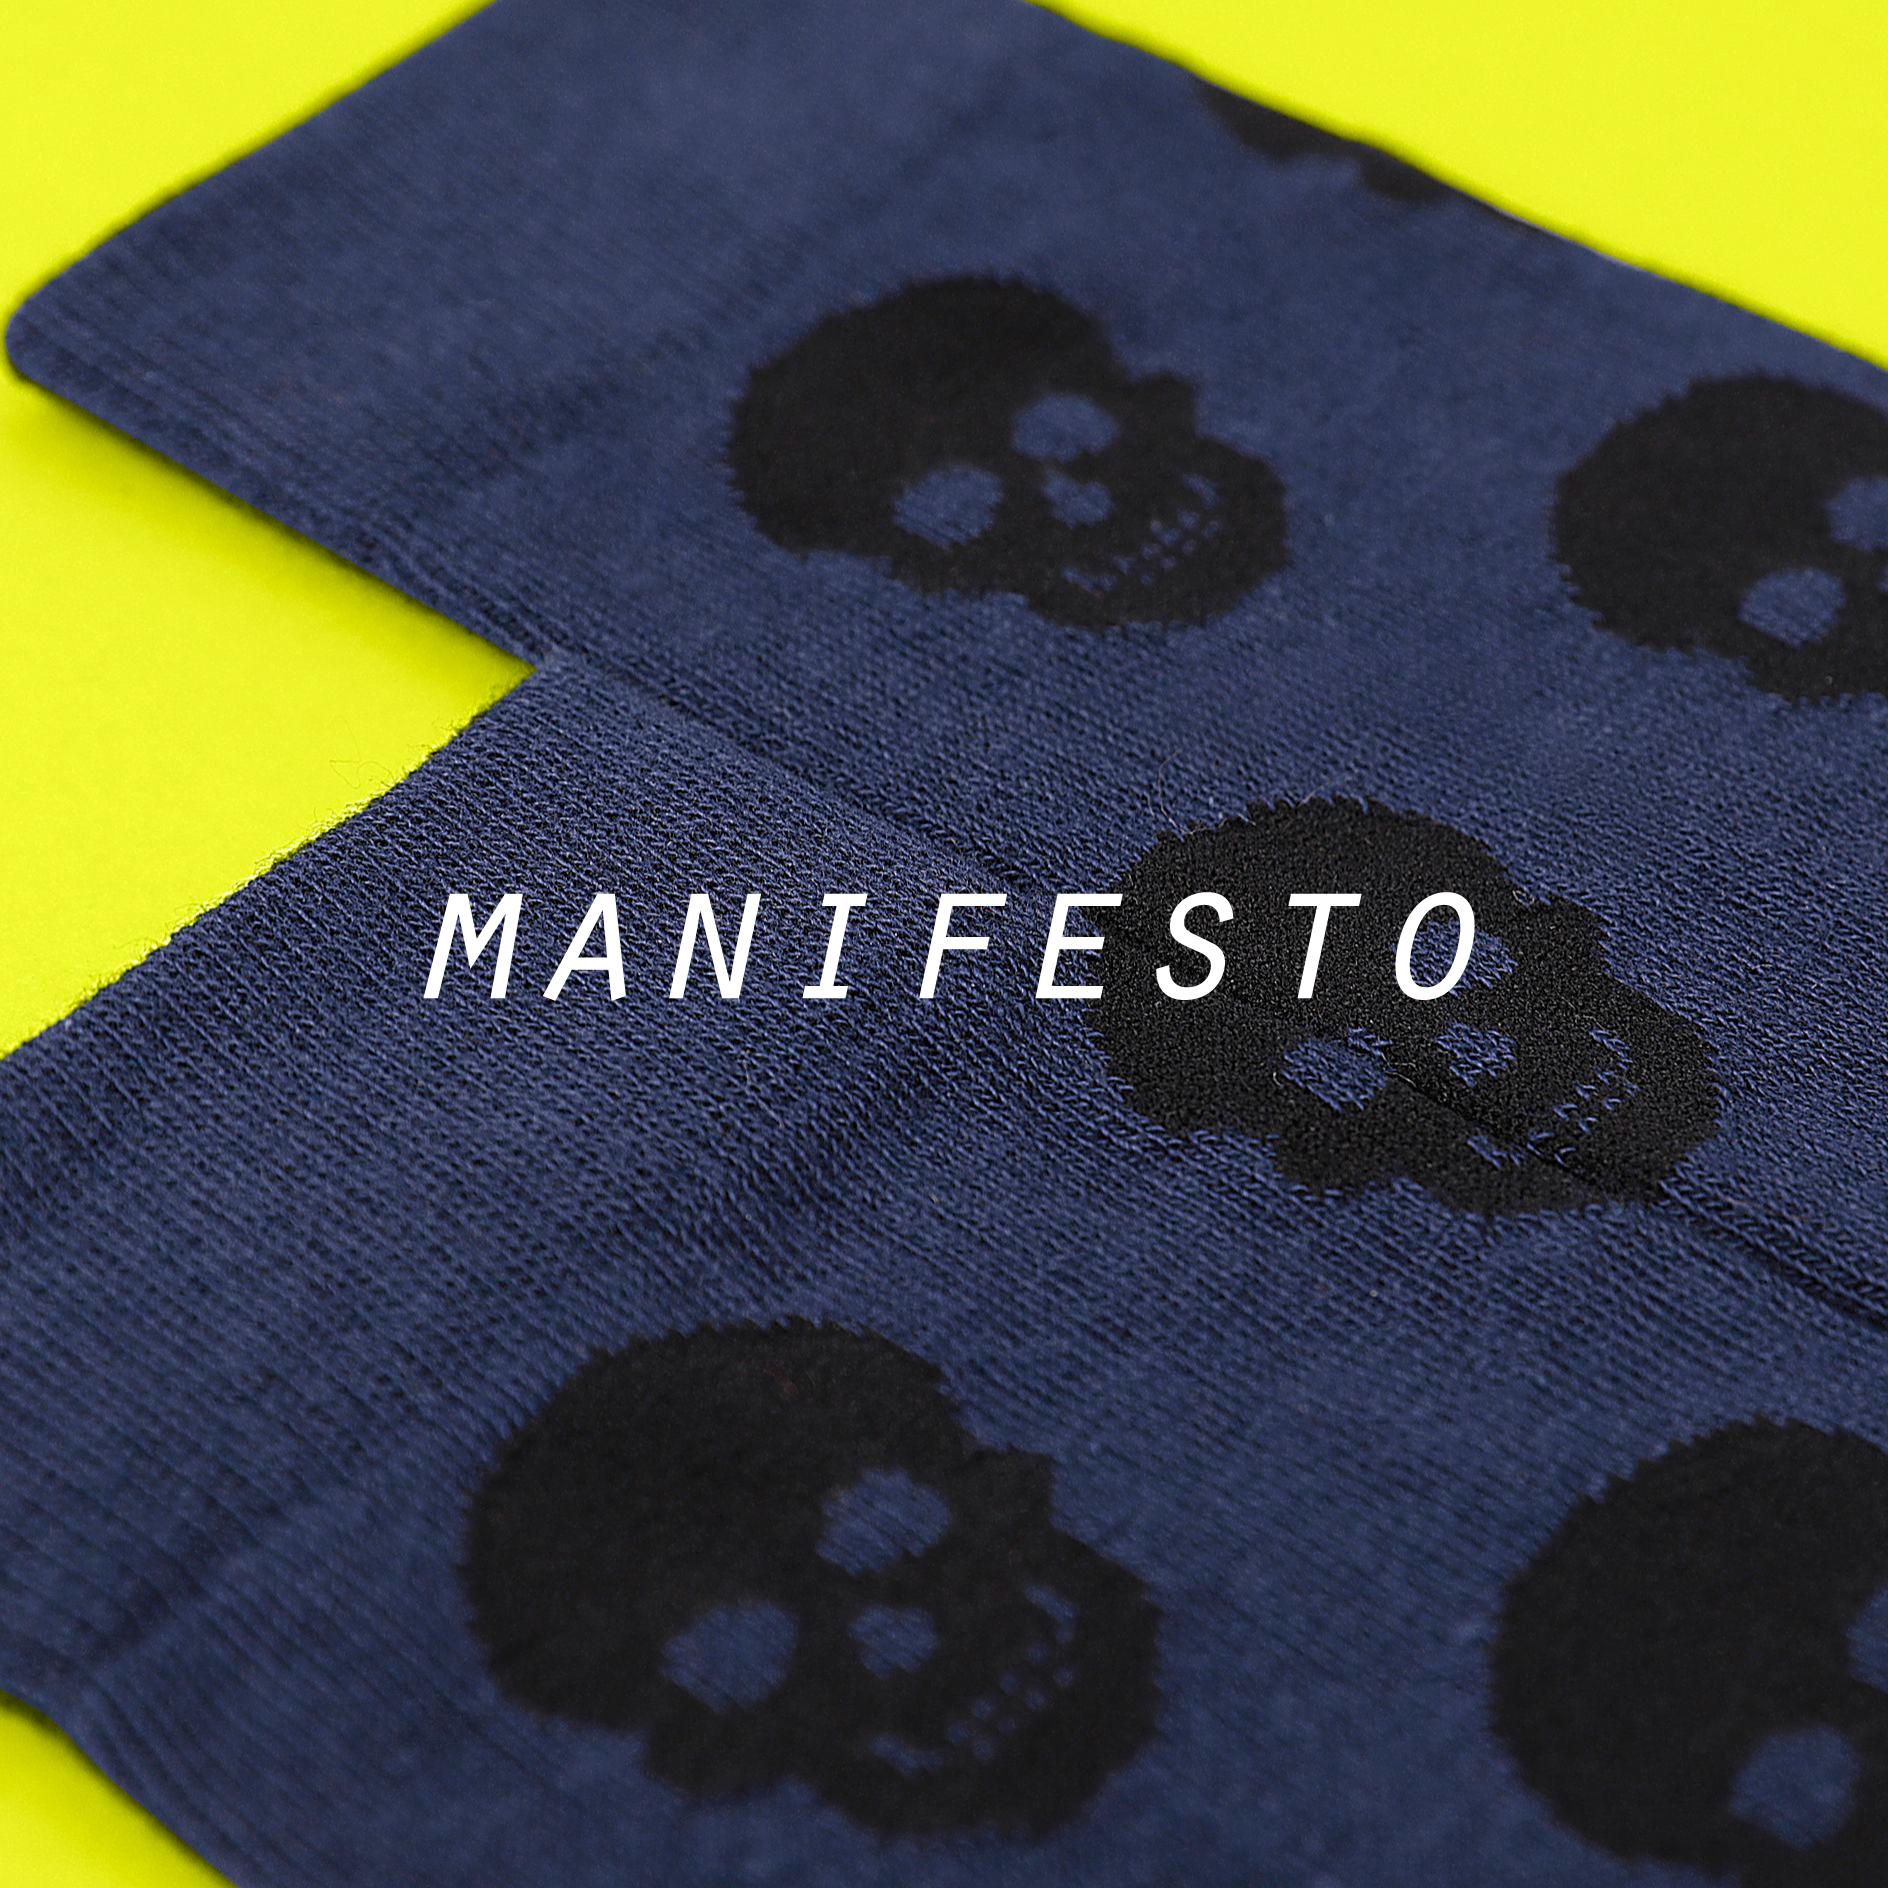 sotb_manifesto-socks-on-the-beat